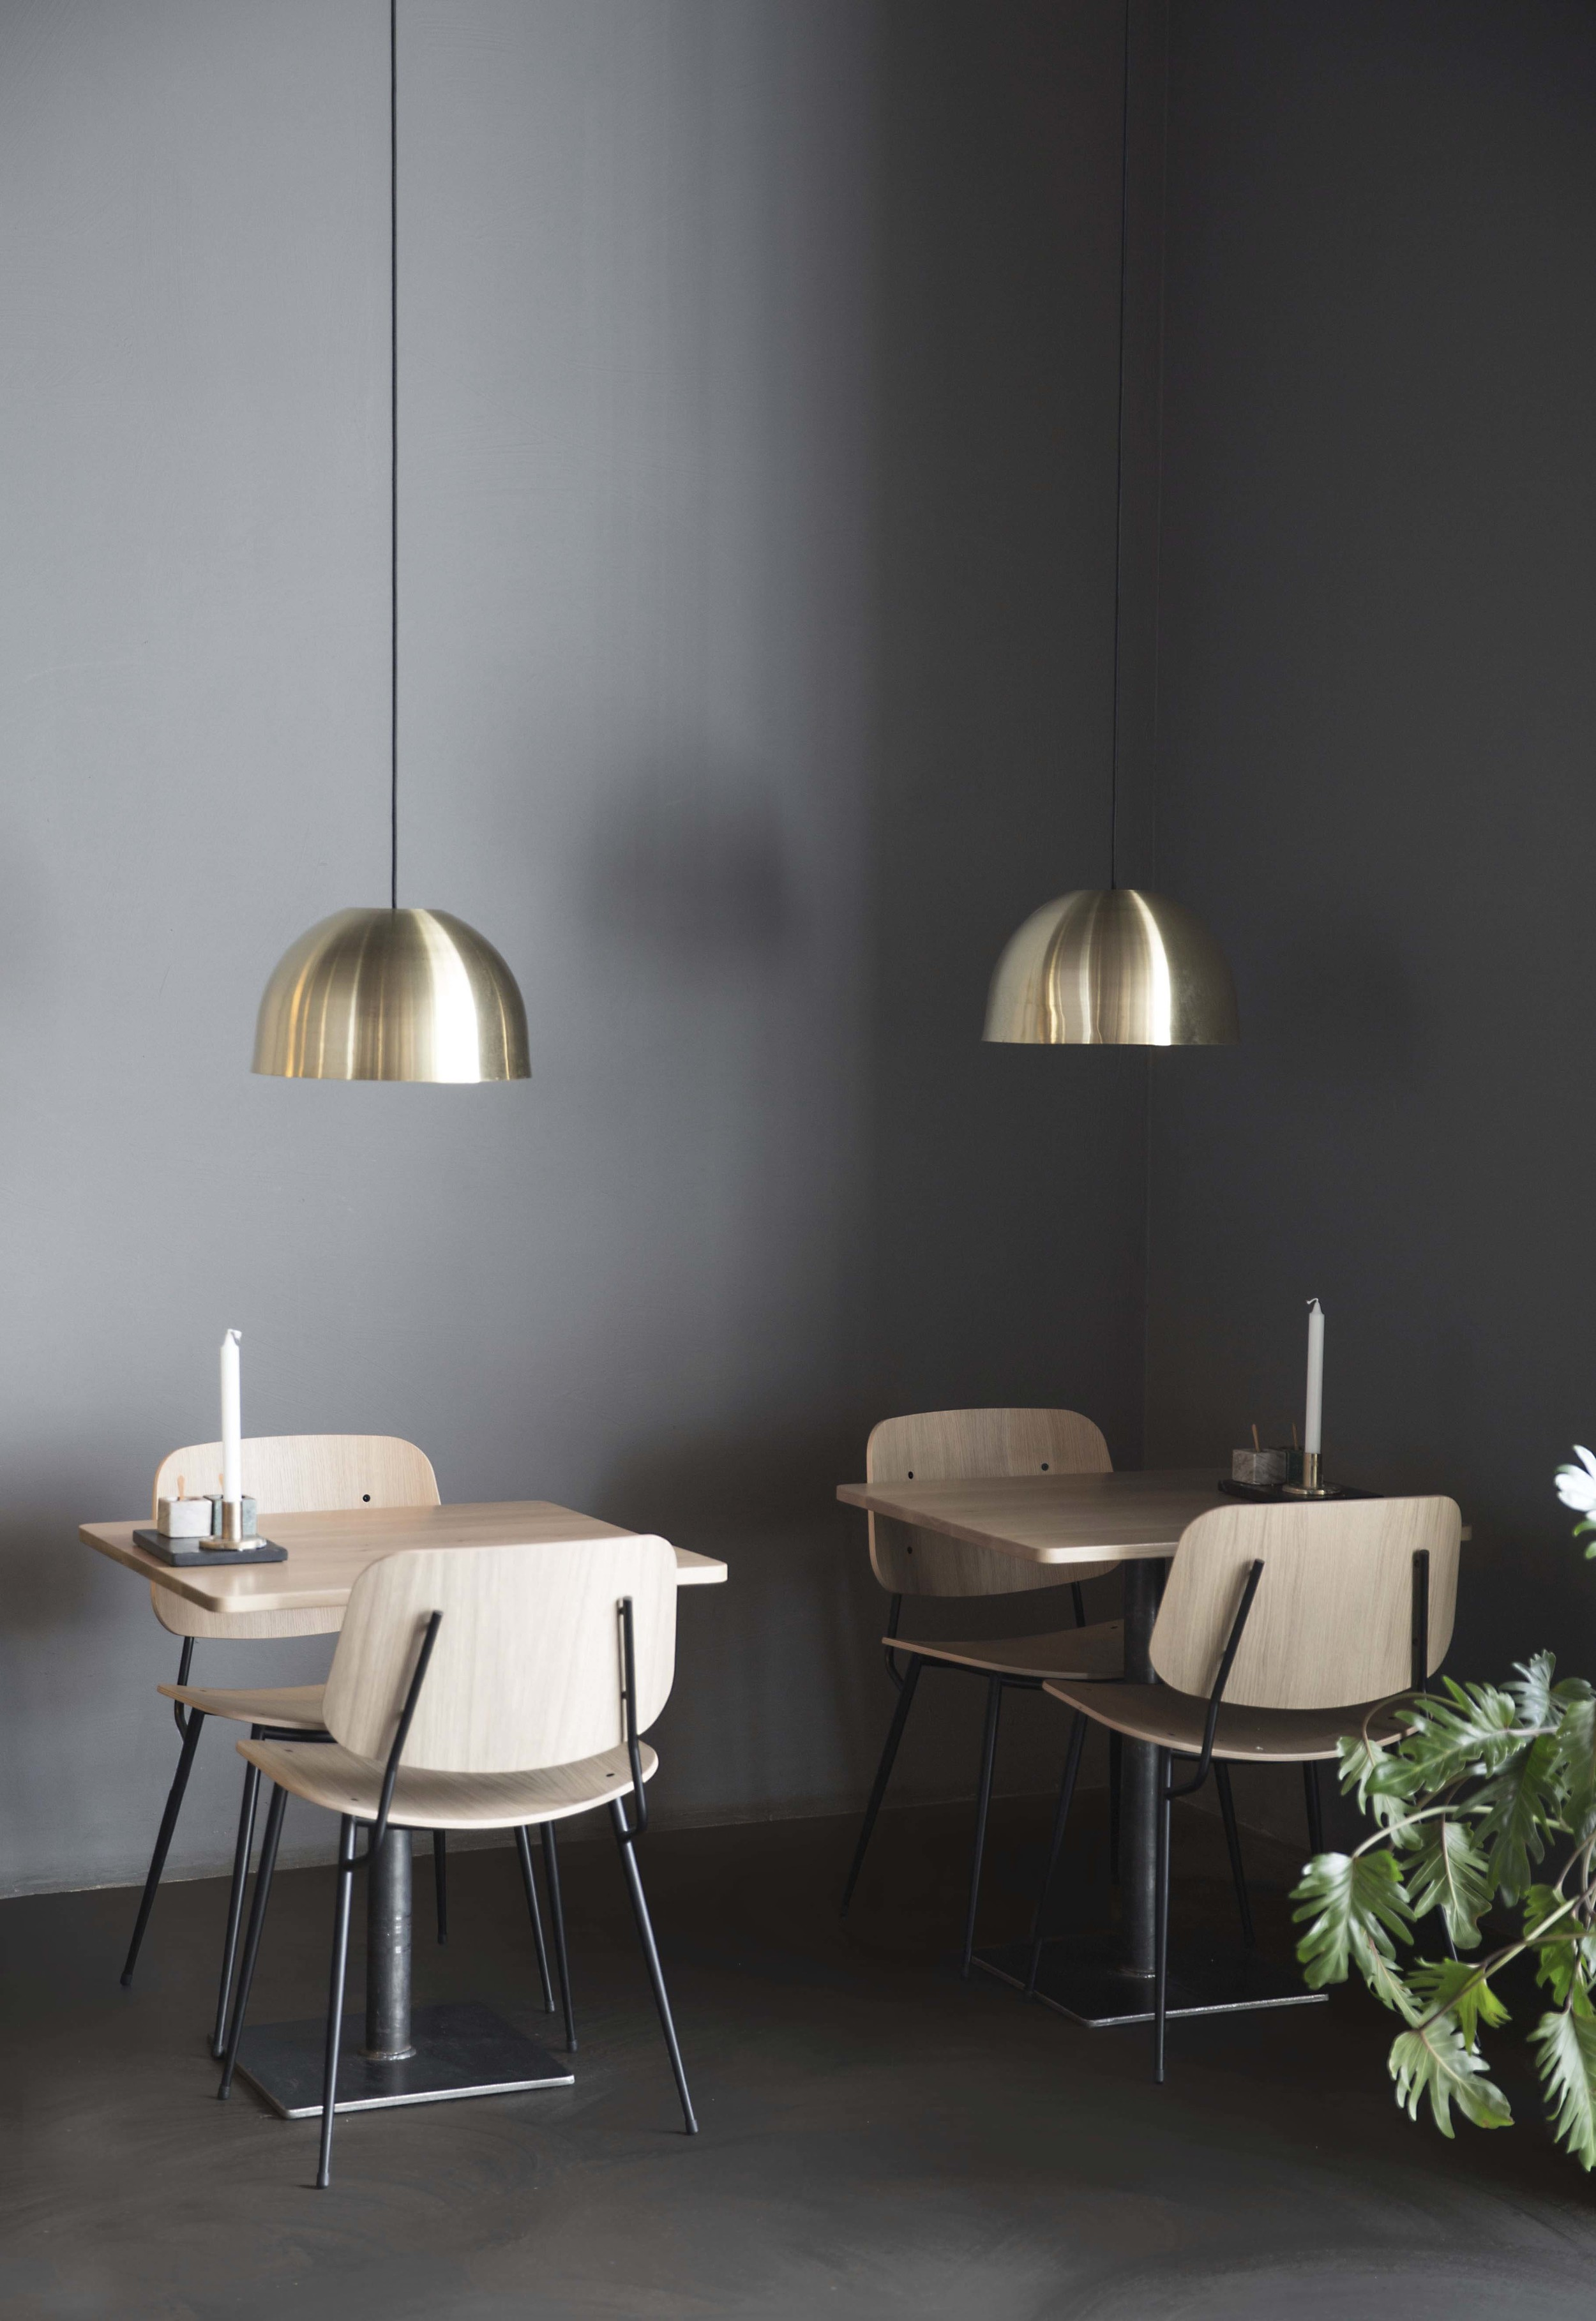 Interior design and Scnadinavian furniture in Palæo restaurant in Copenhagen designed by Johannes Torpe Studios